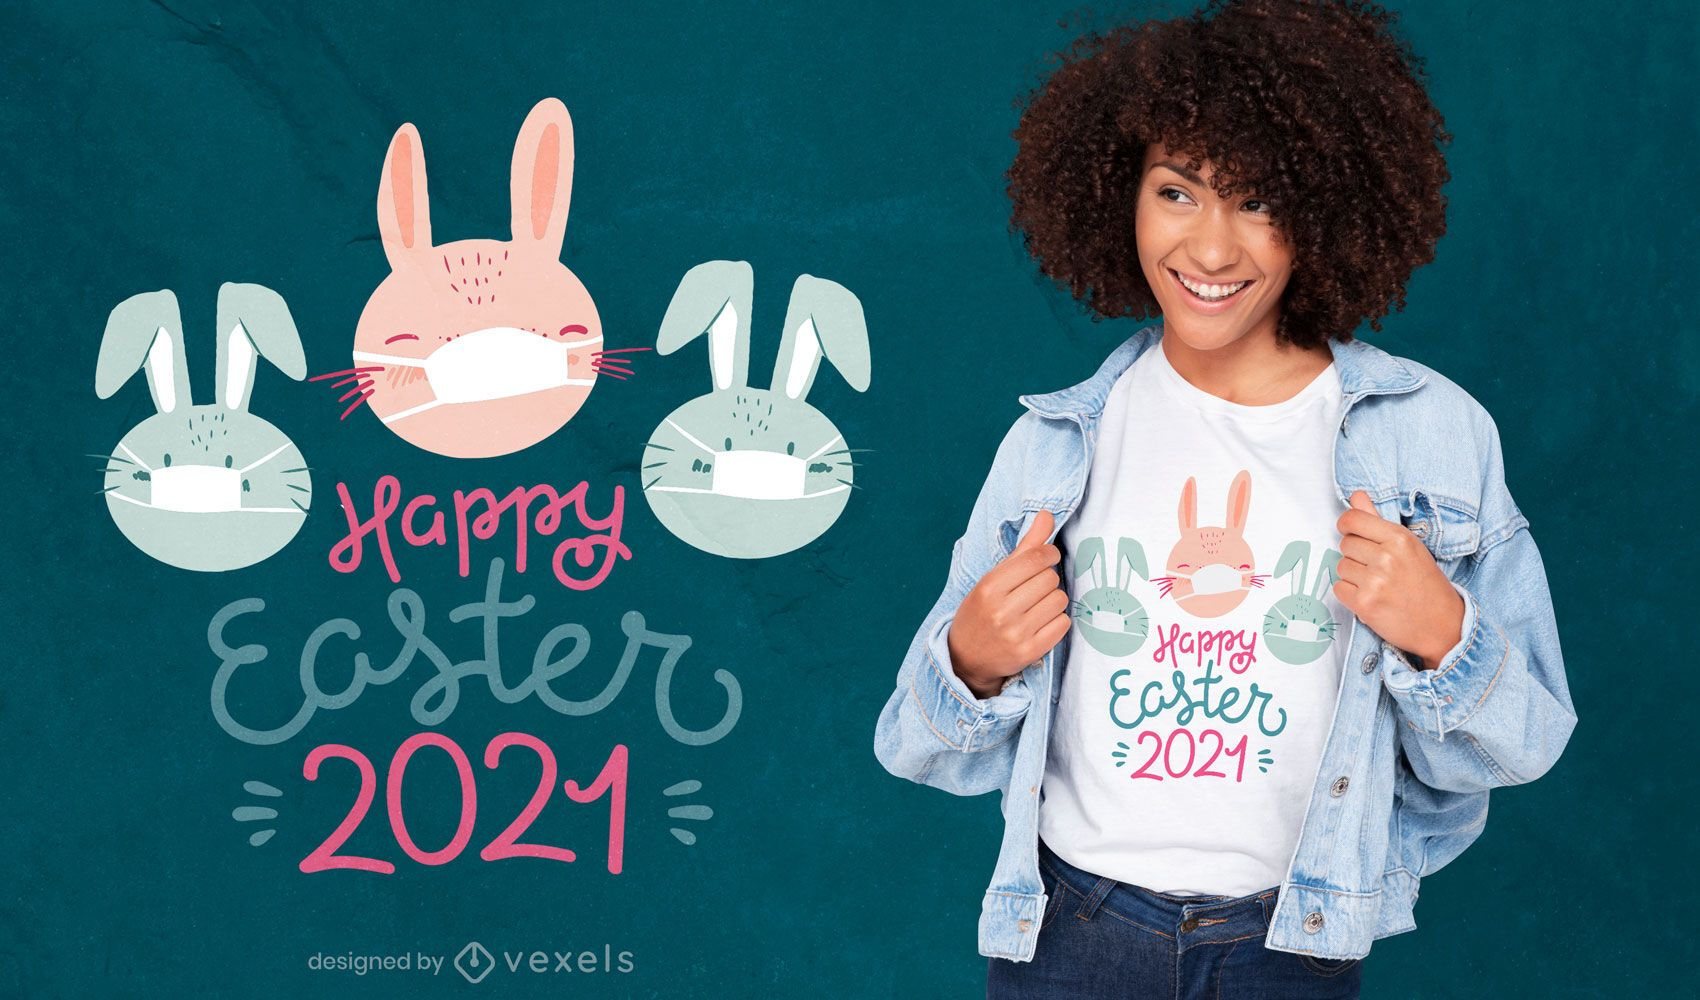 Easter 2021 t-shirt design